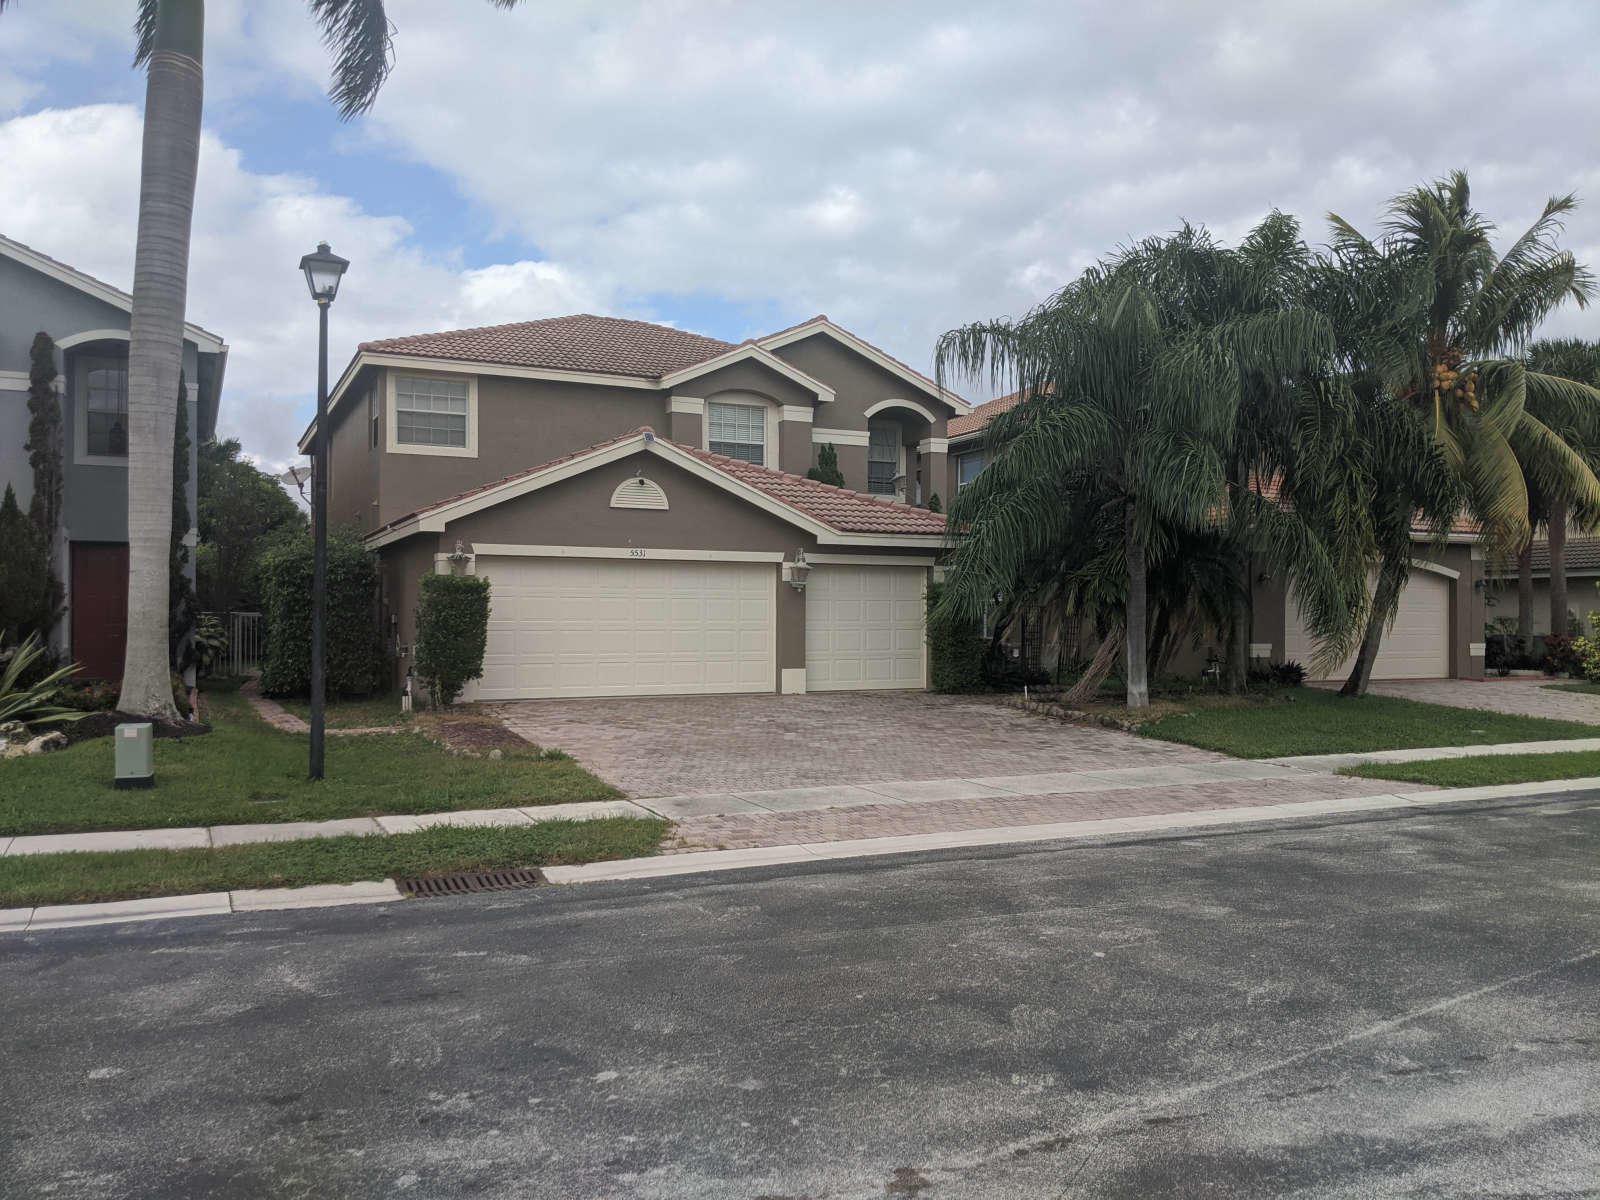 5531 Baja Terrace, Greenacres, FL 33463 - #: RX-10670493